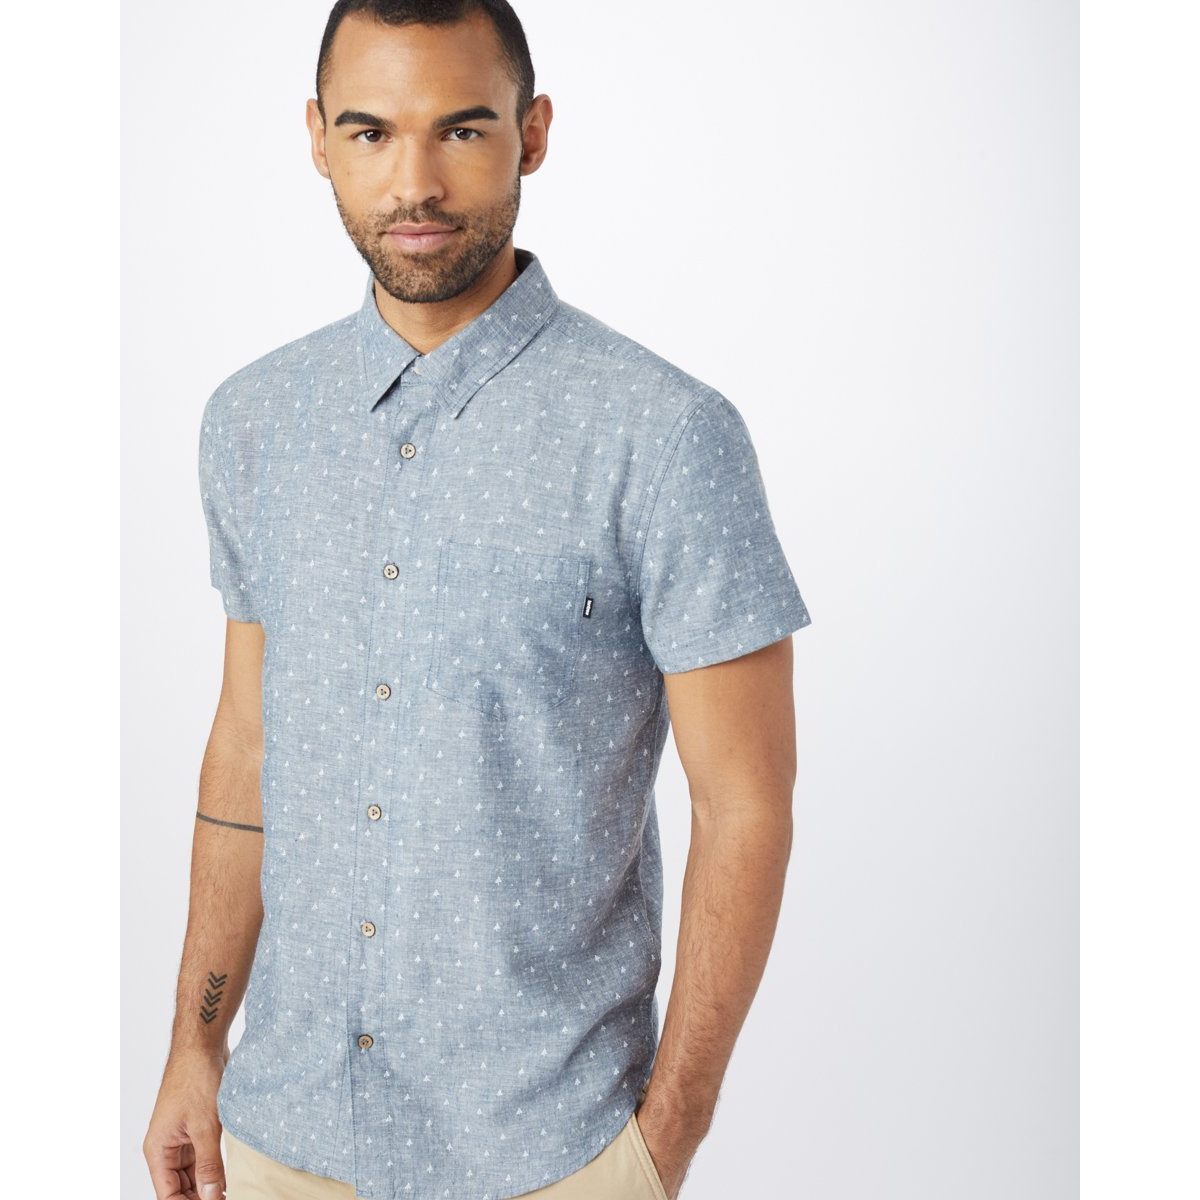 Mancos Button Up Short Sleeve -Men's